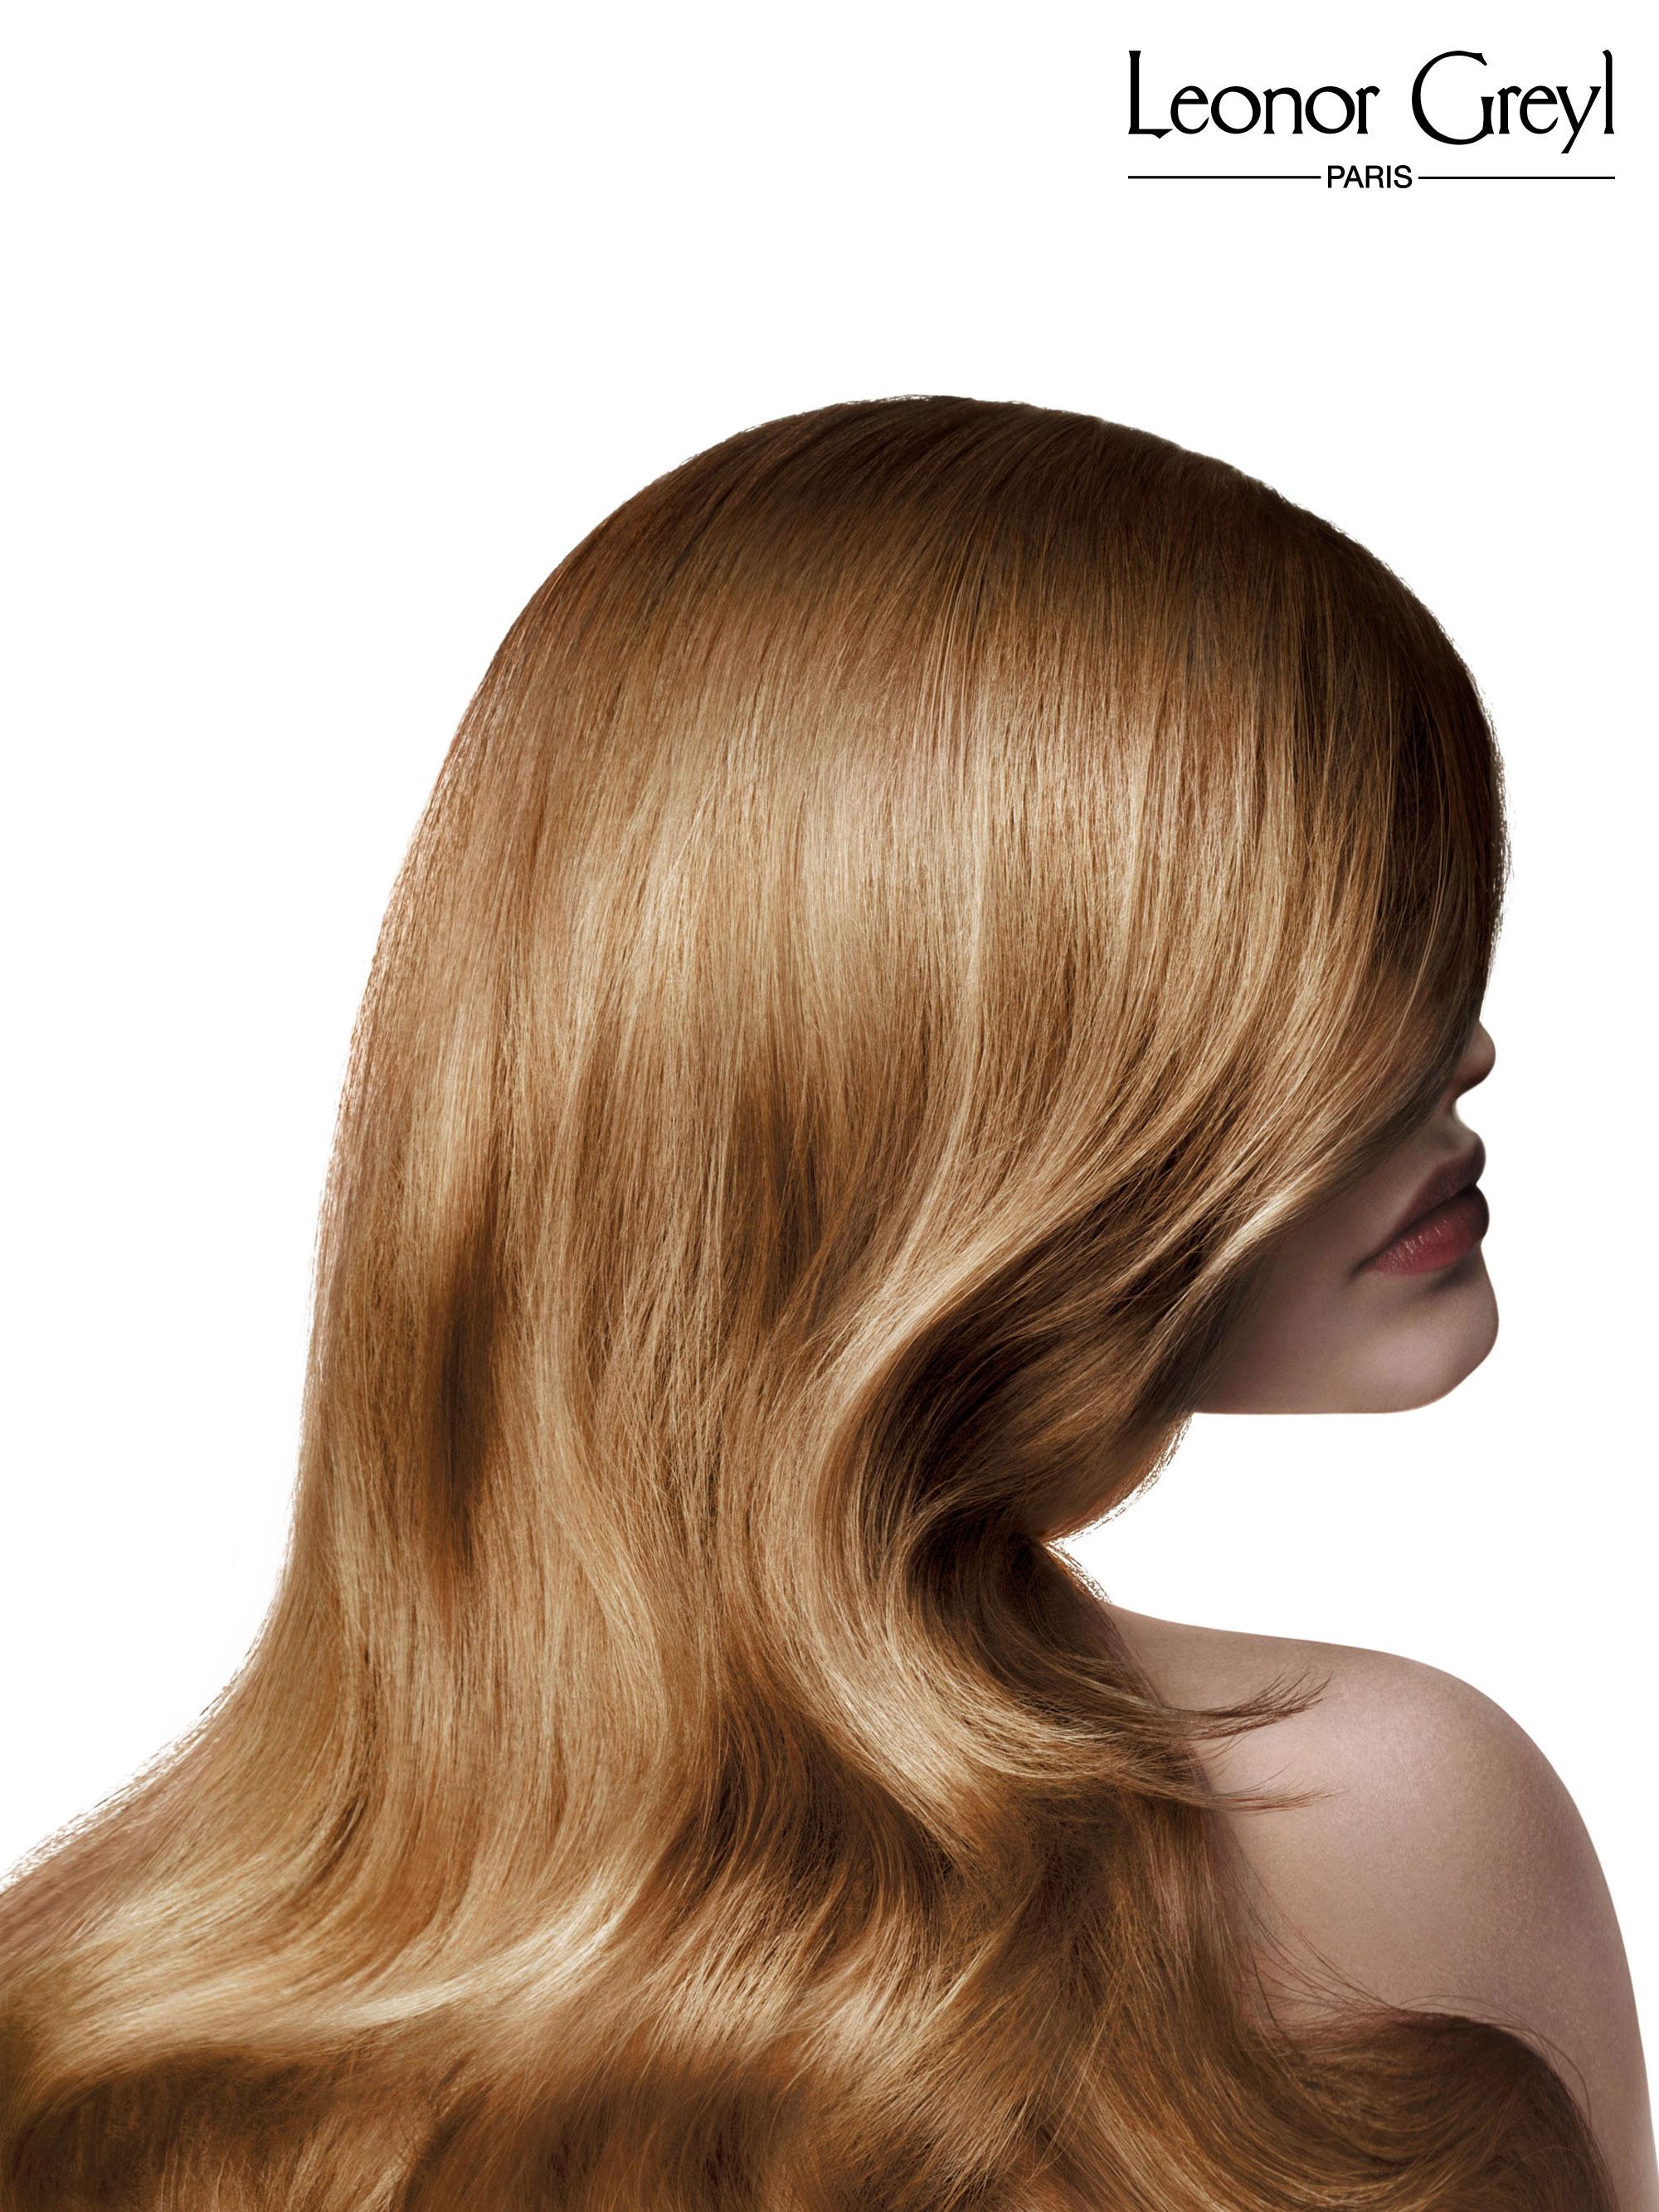 leonor-greyl-03b_blond-venitien